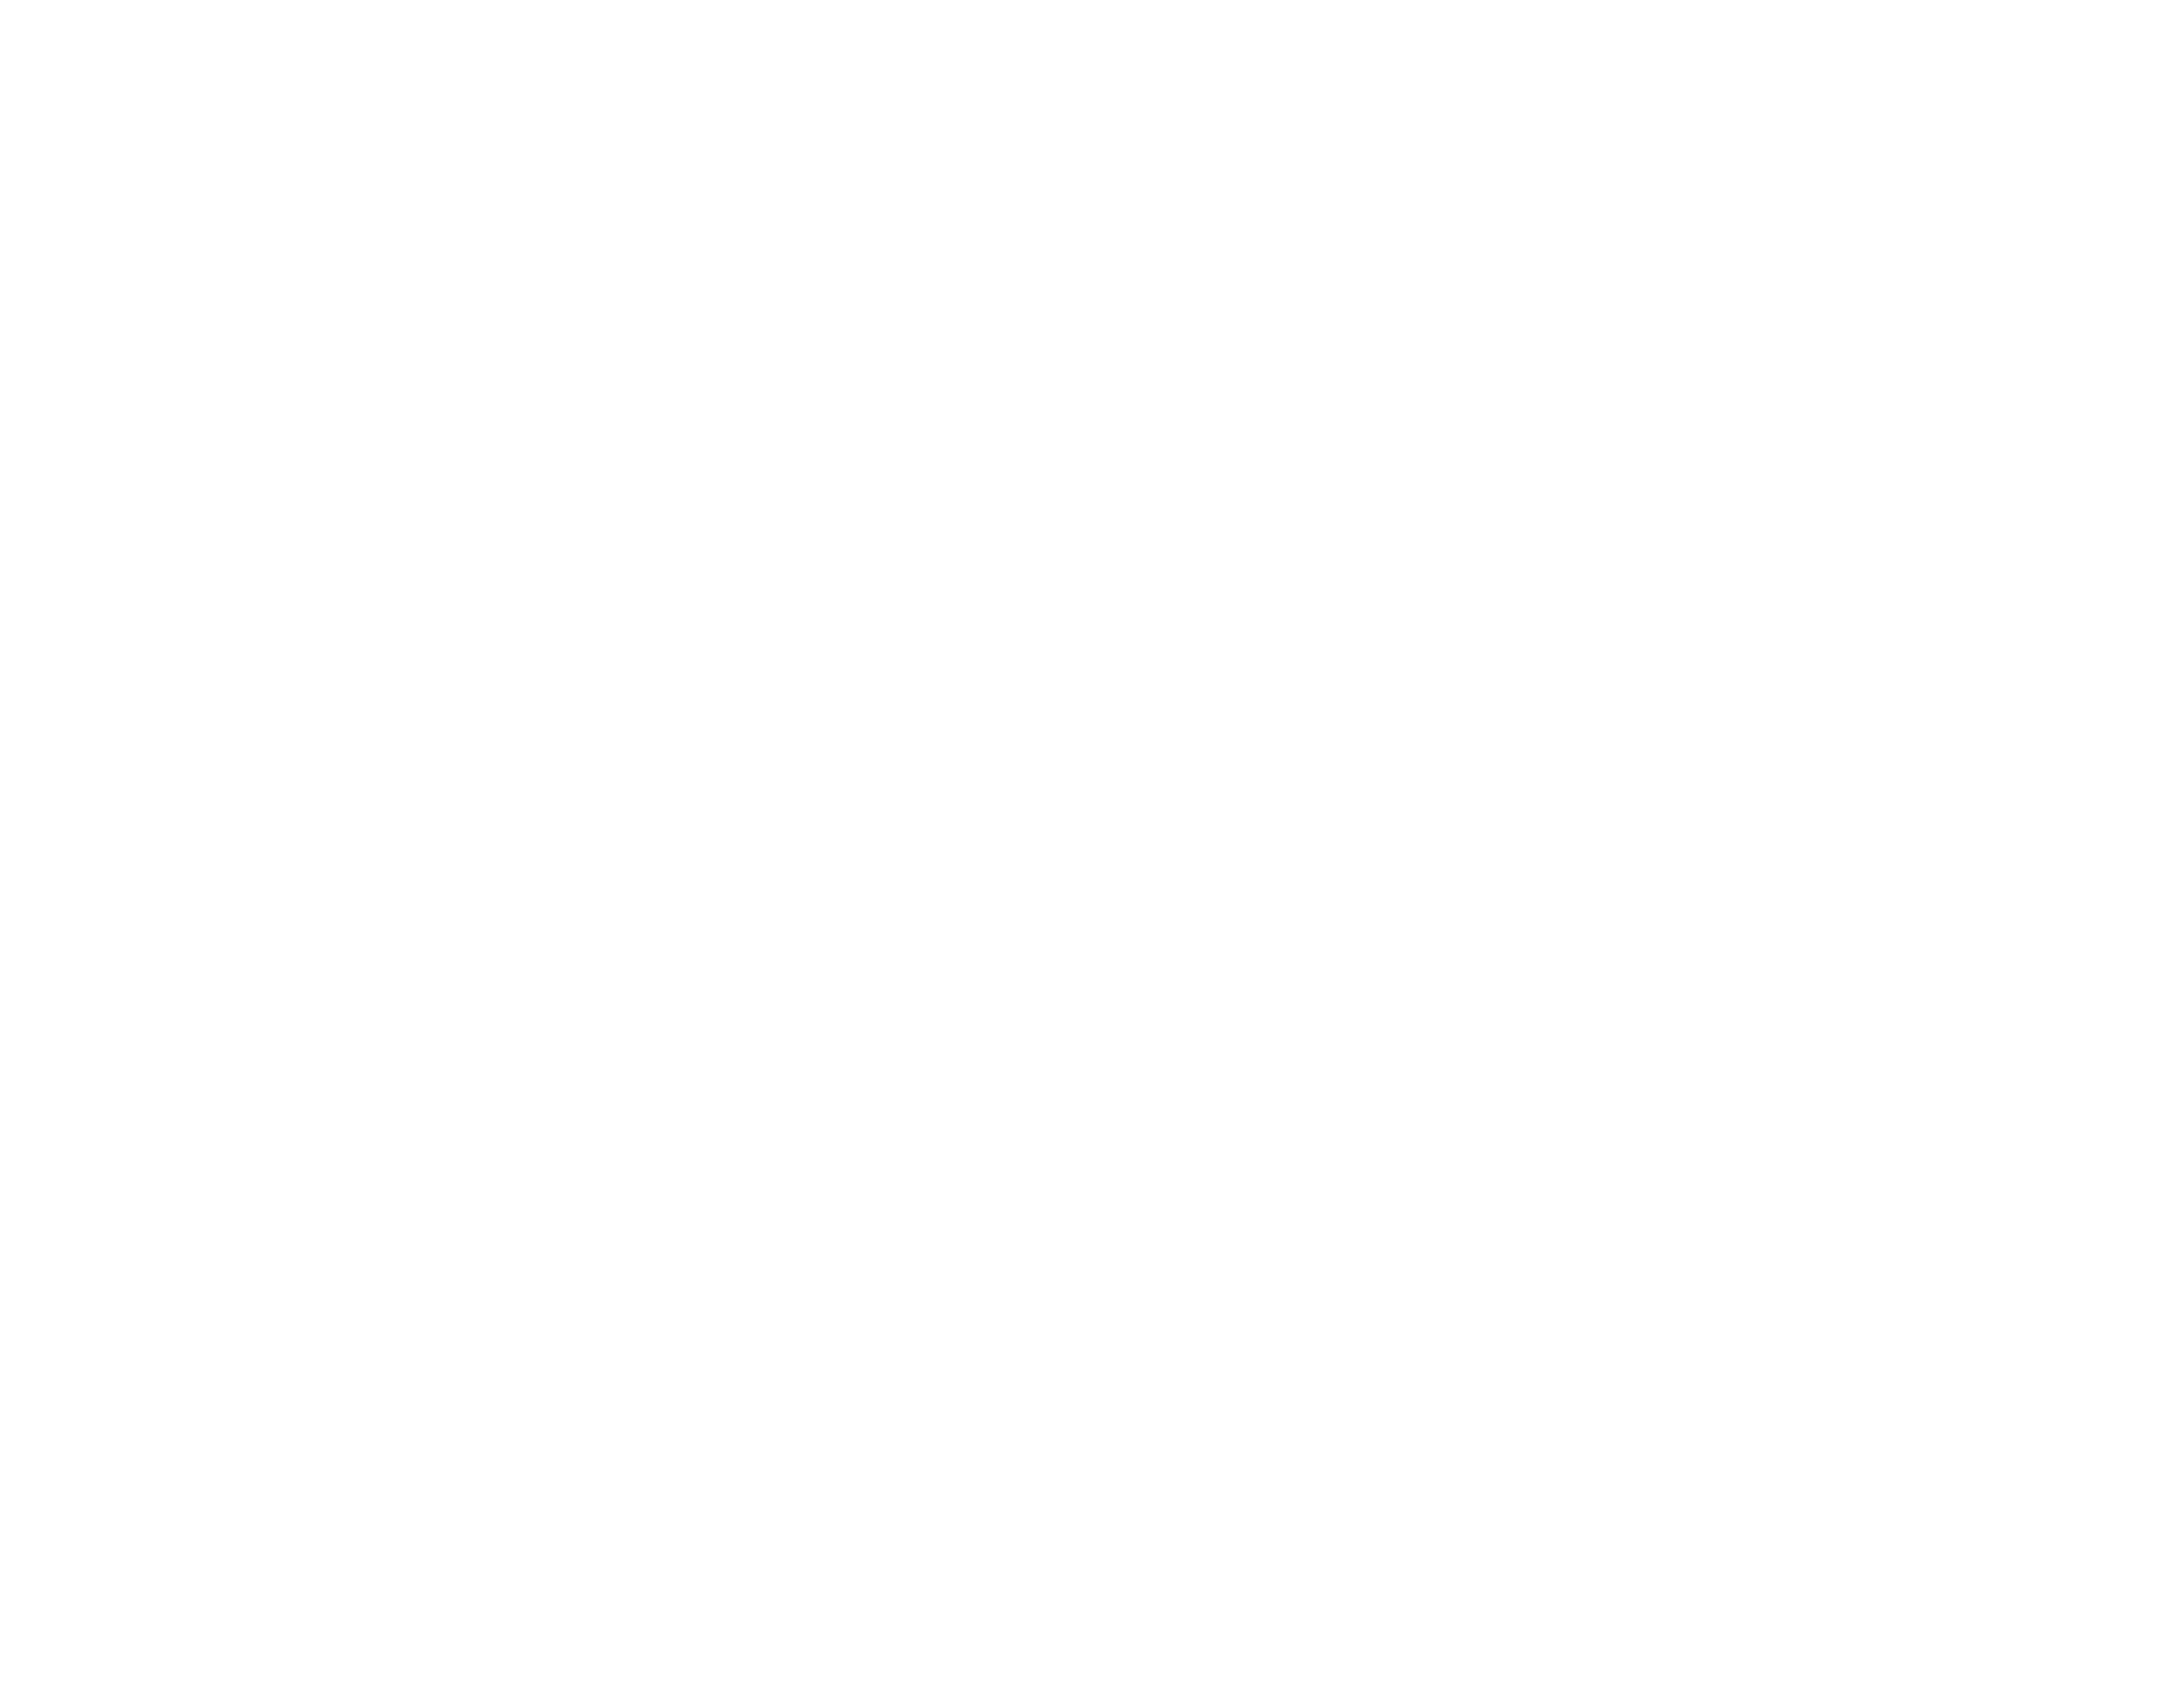 CREE REUNION